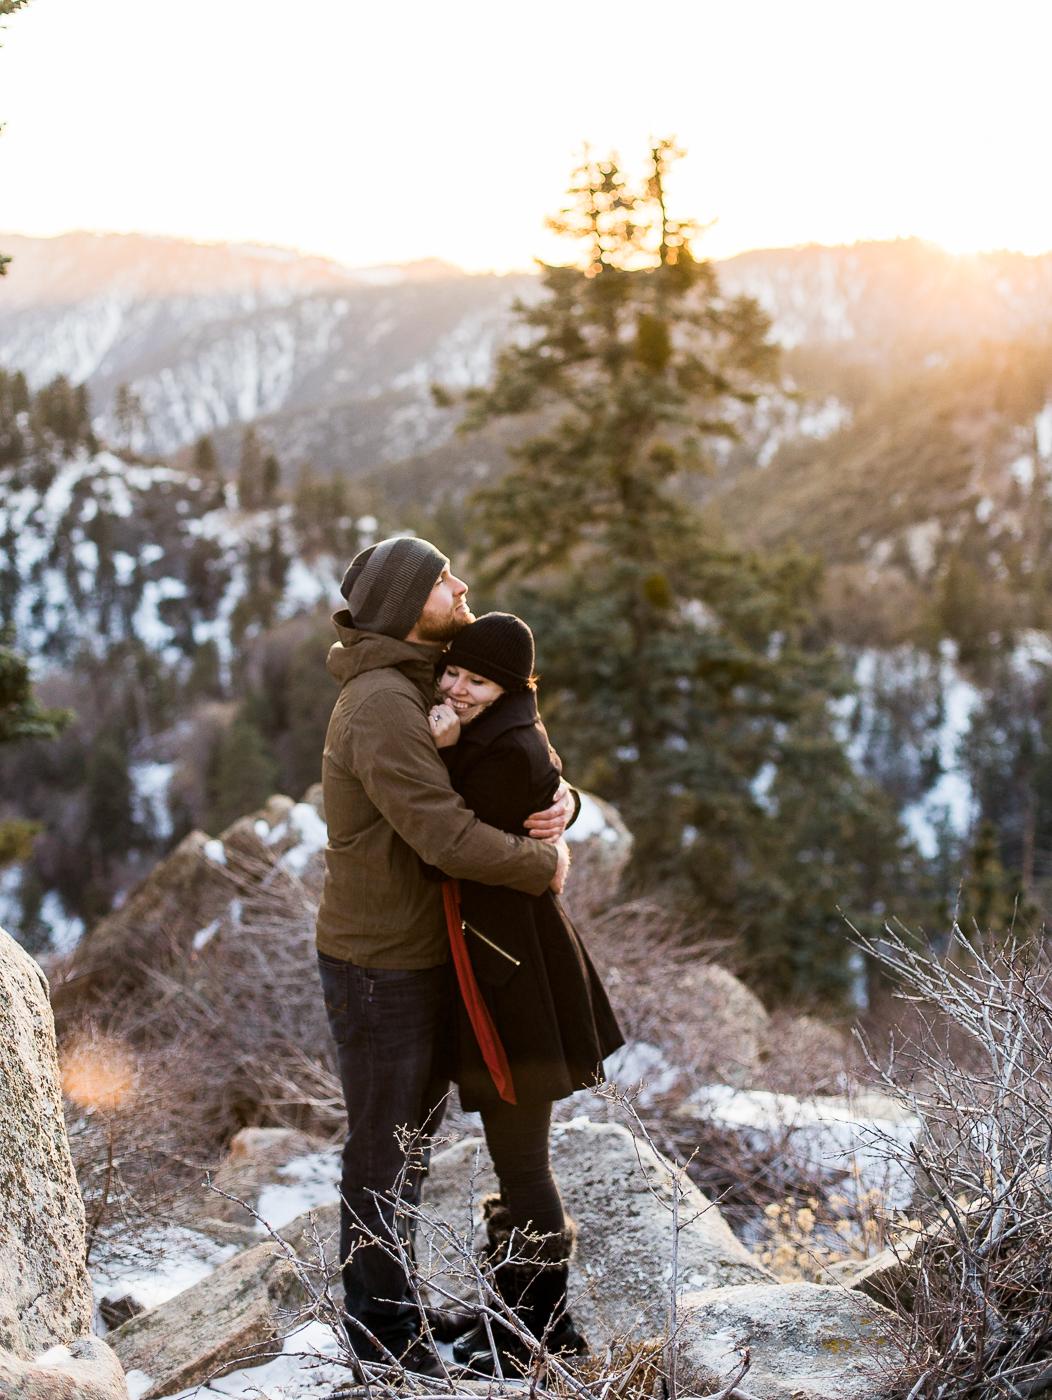 California Big Bear Engagements by Wyoming based photographer, Megan Lee Photography